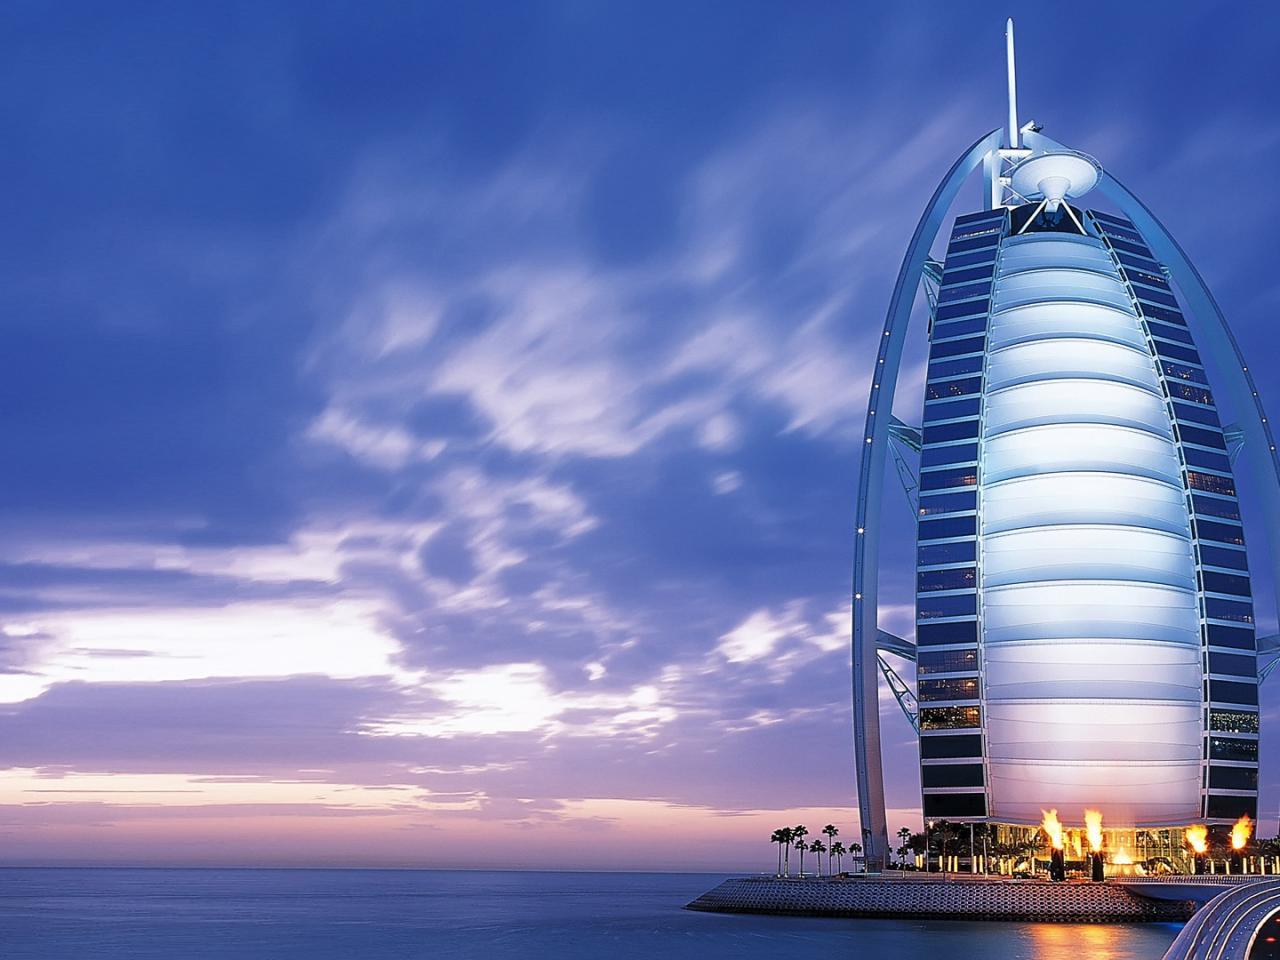 The Dubai Seven Star Hotel | Info & New Photos | Travel ...